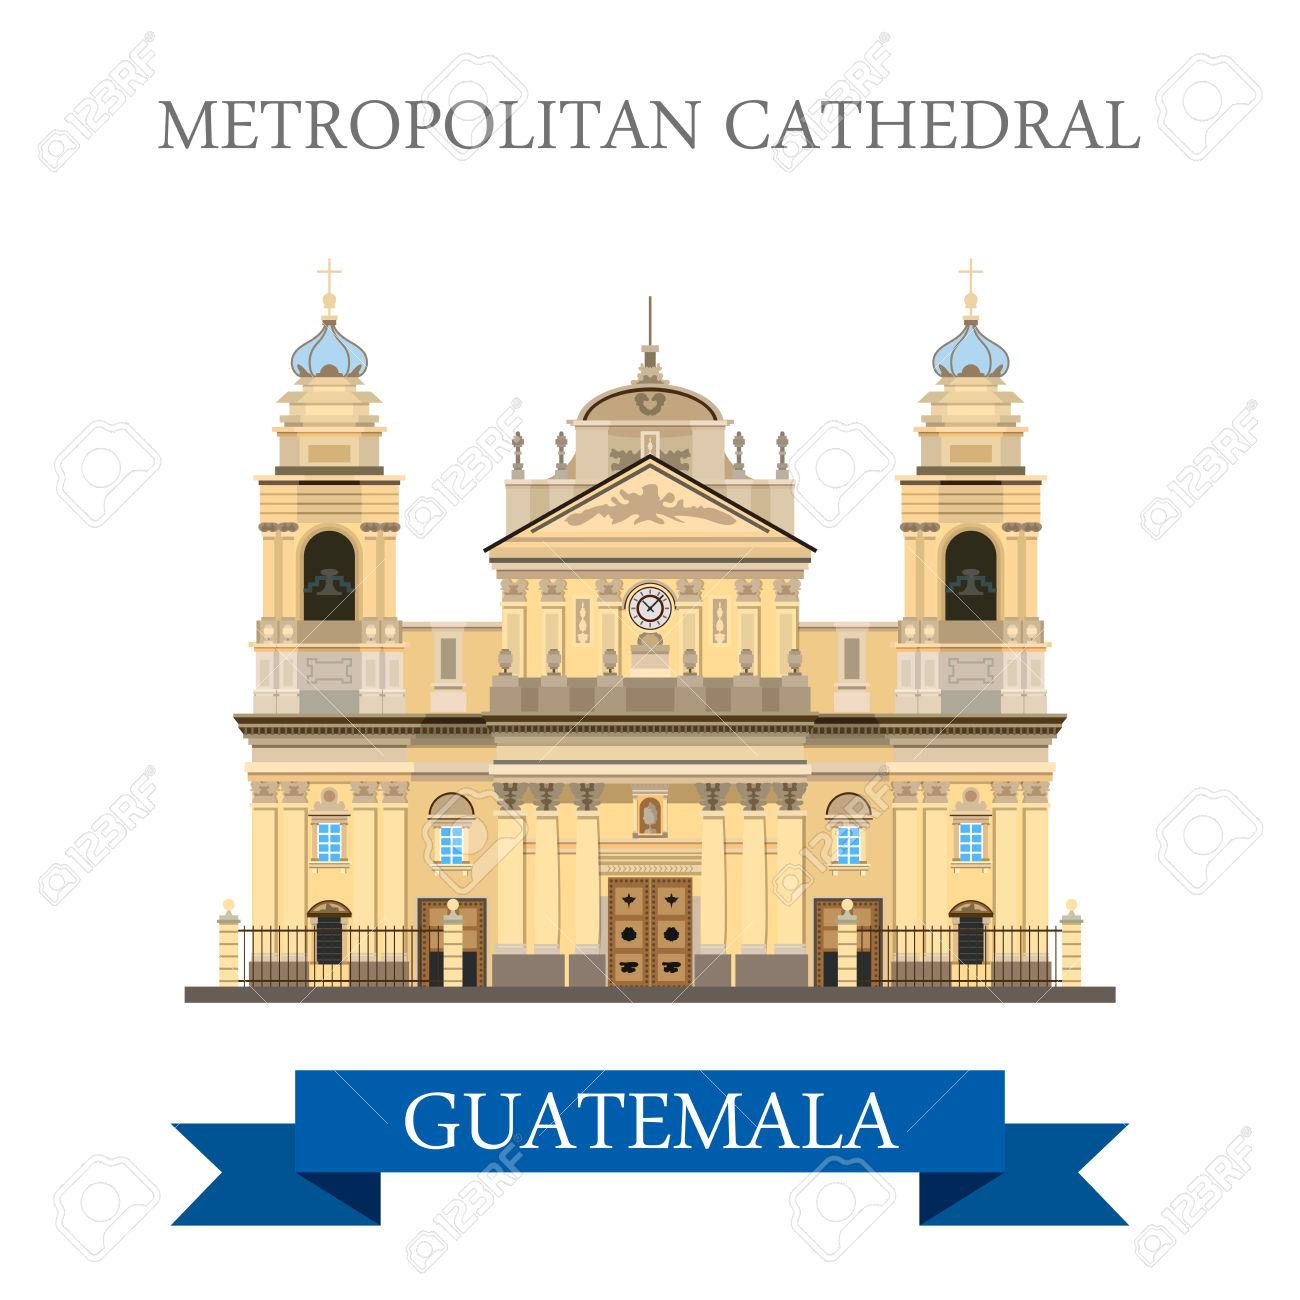 Catedral Metropolitana De Santiago En Guatemala. Estilo De Dibujos.